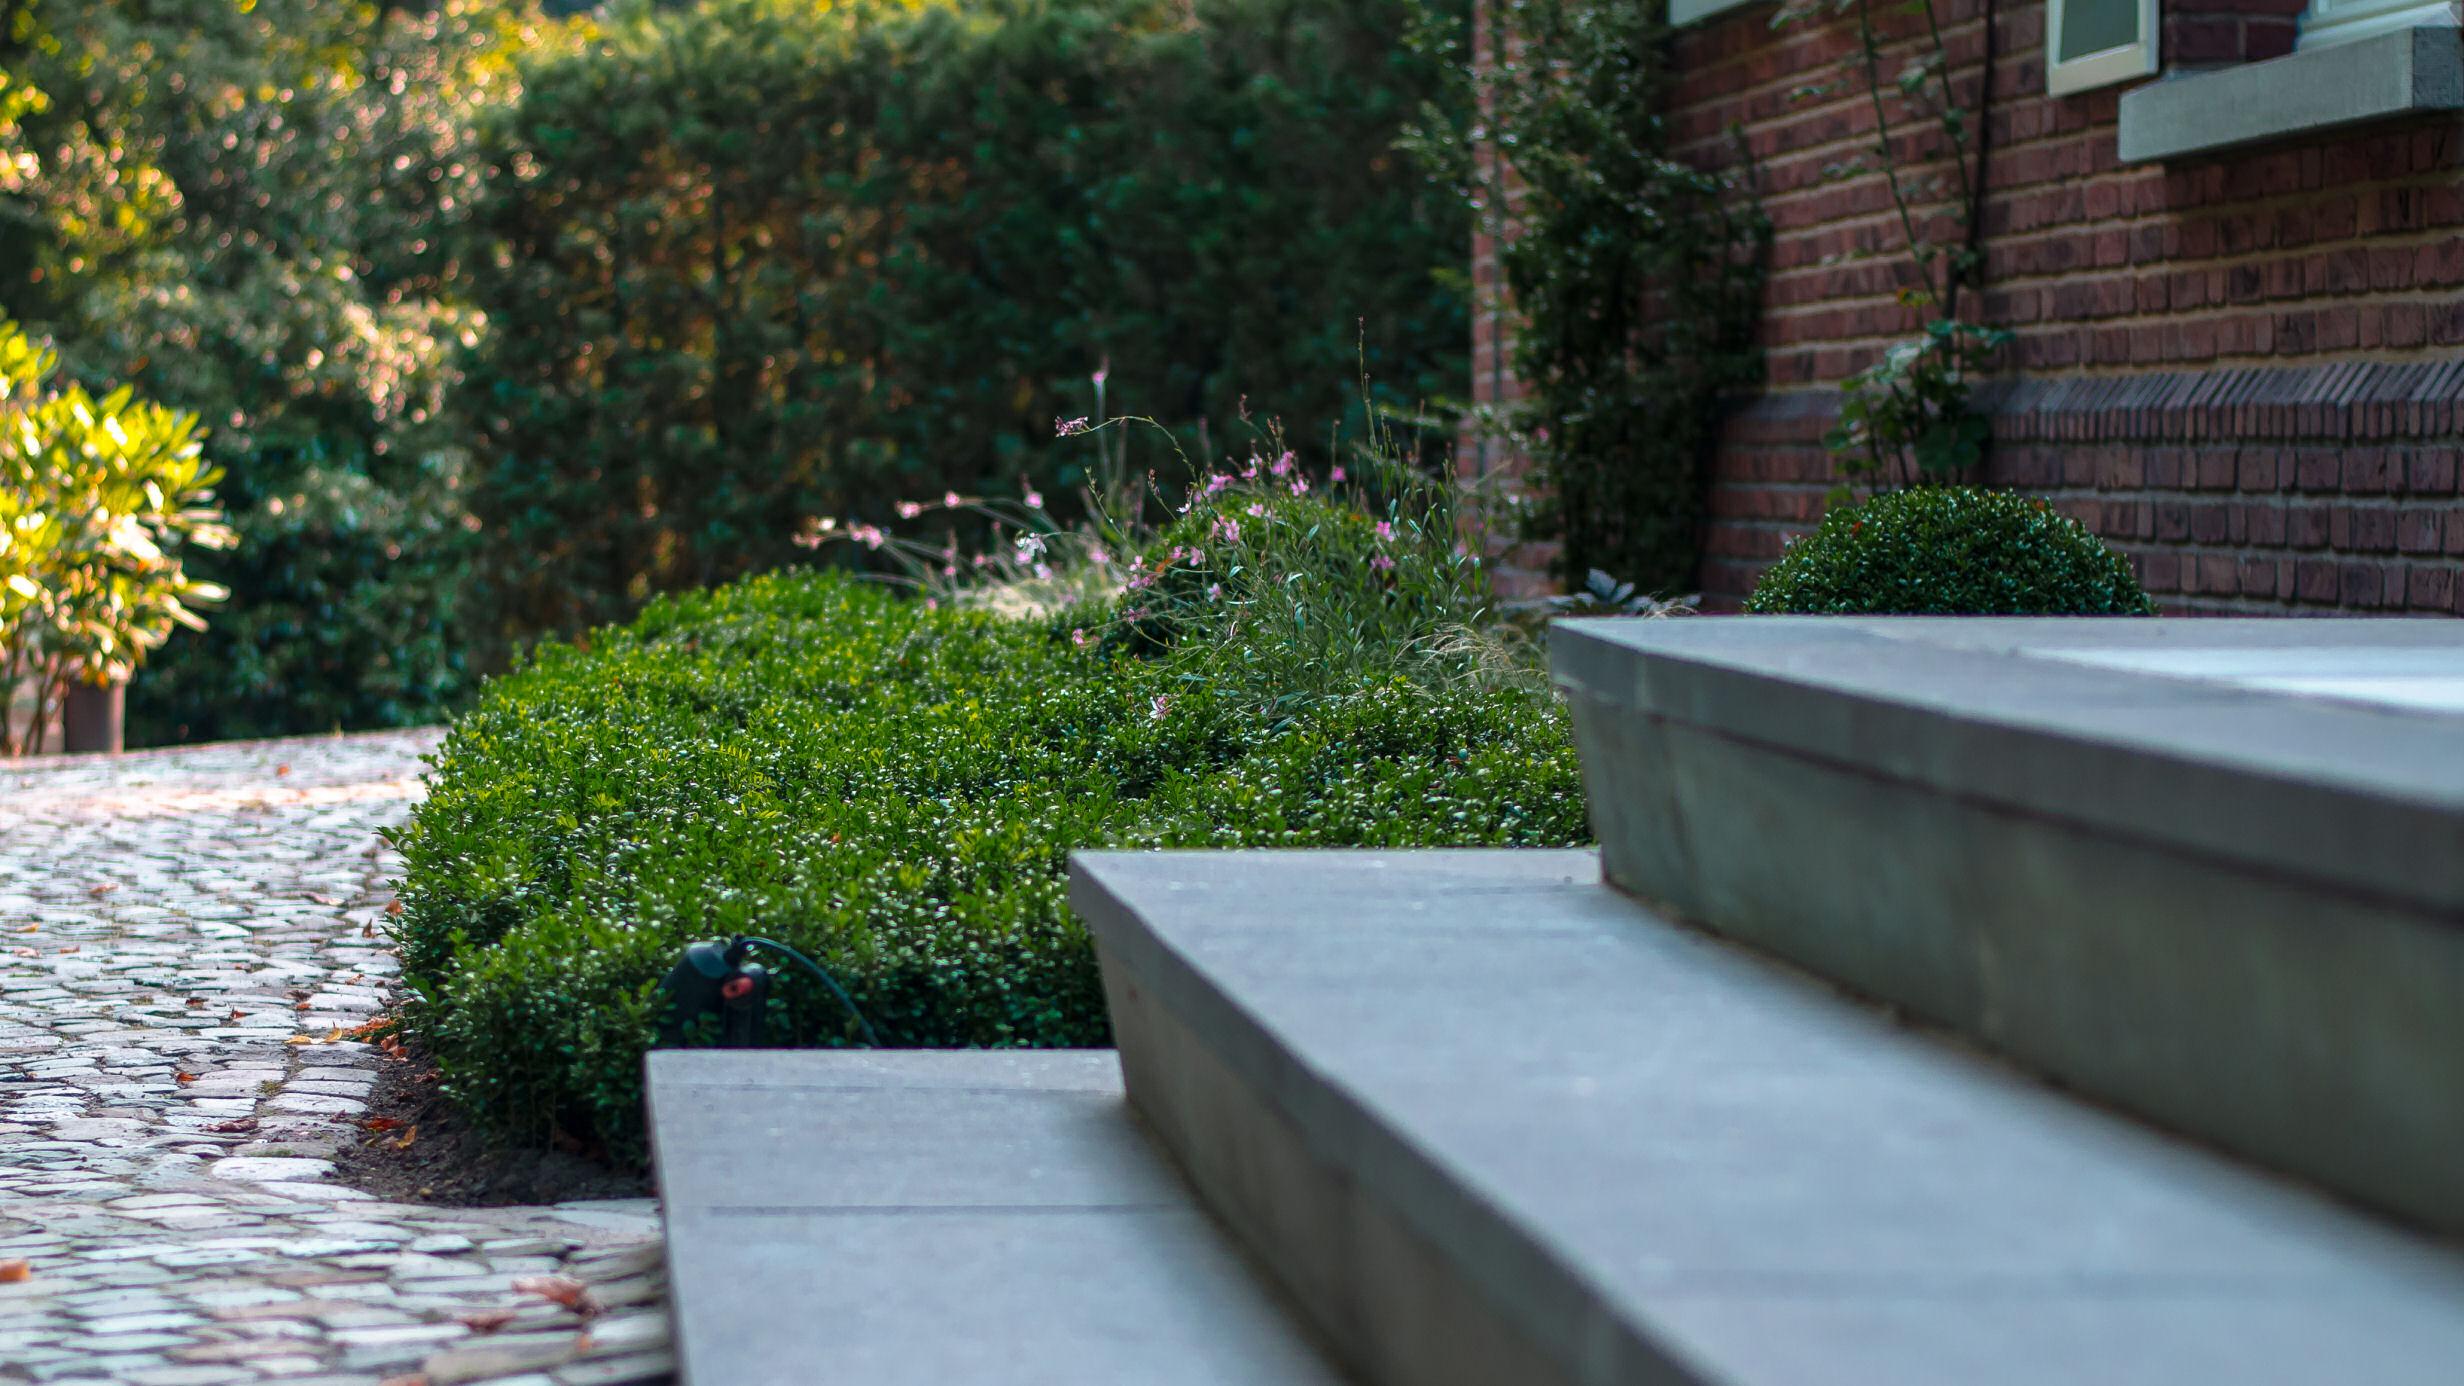 buxus, bodembedekker, tuin, tuinaanleg, trap